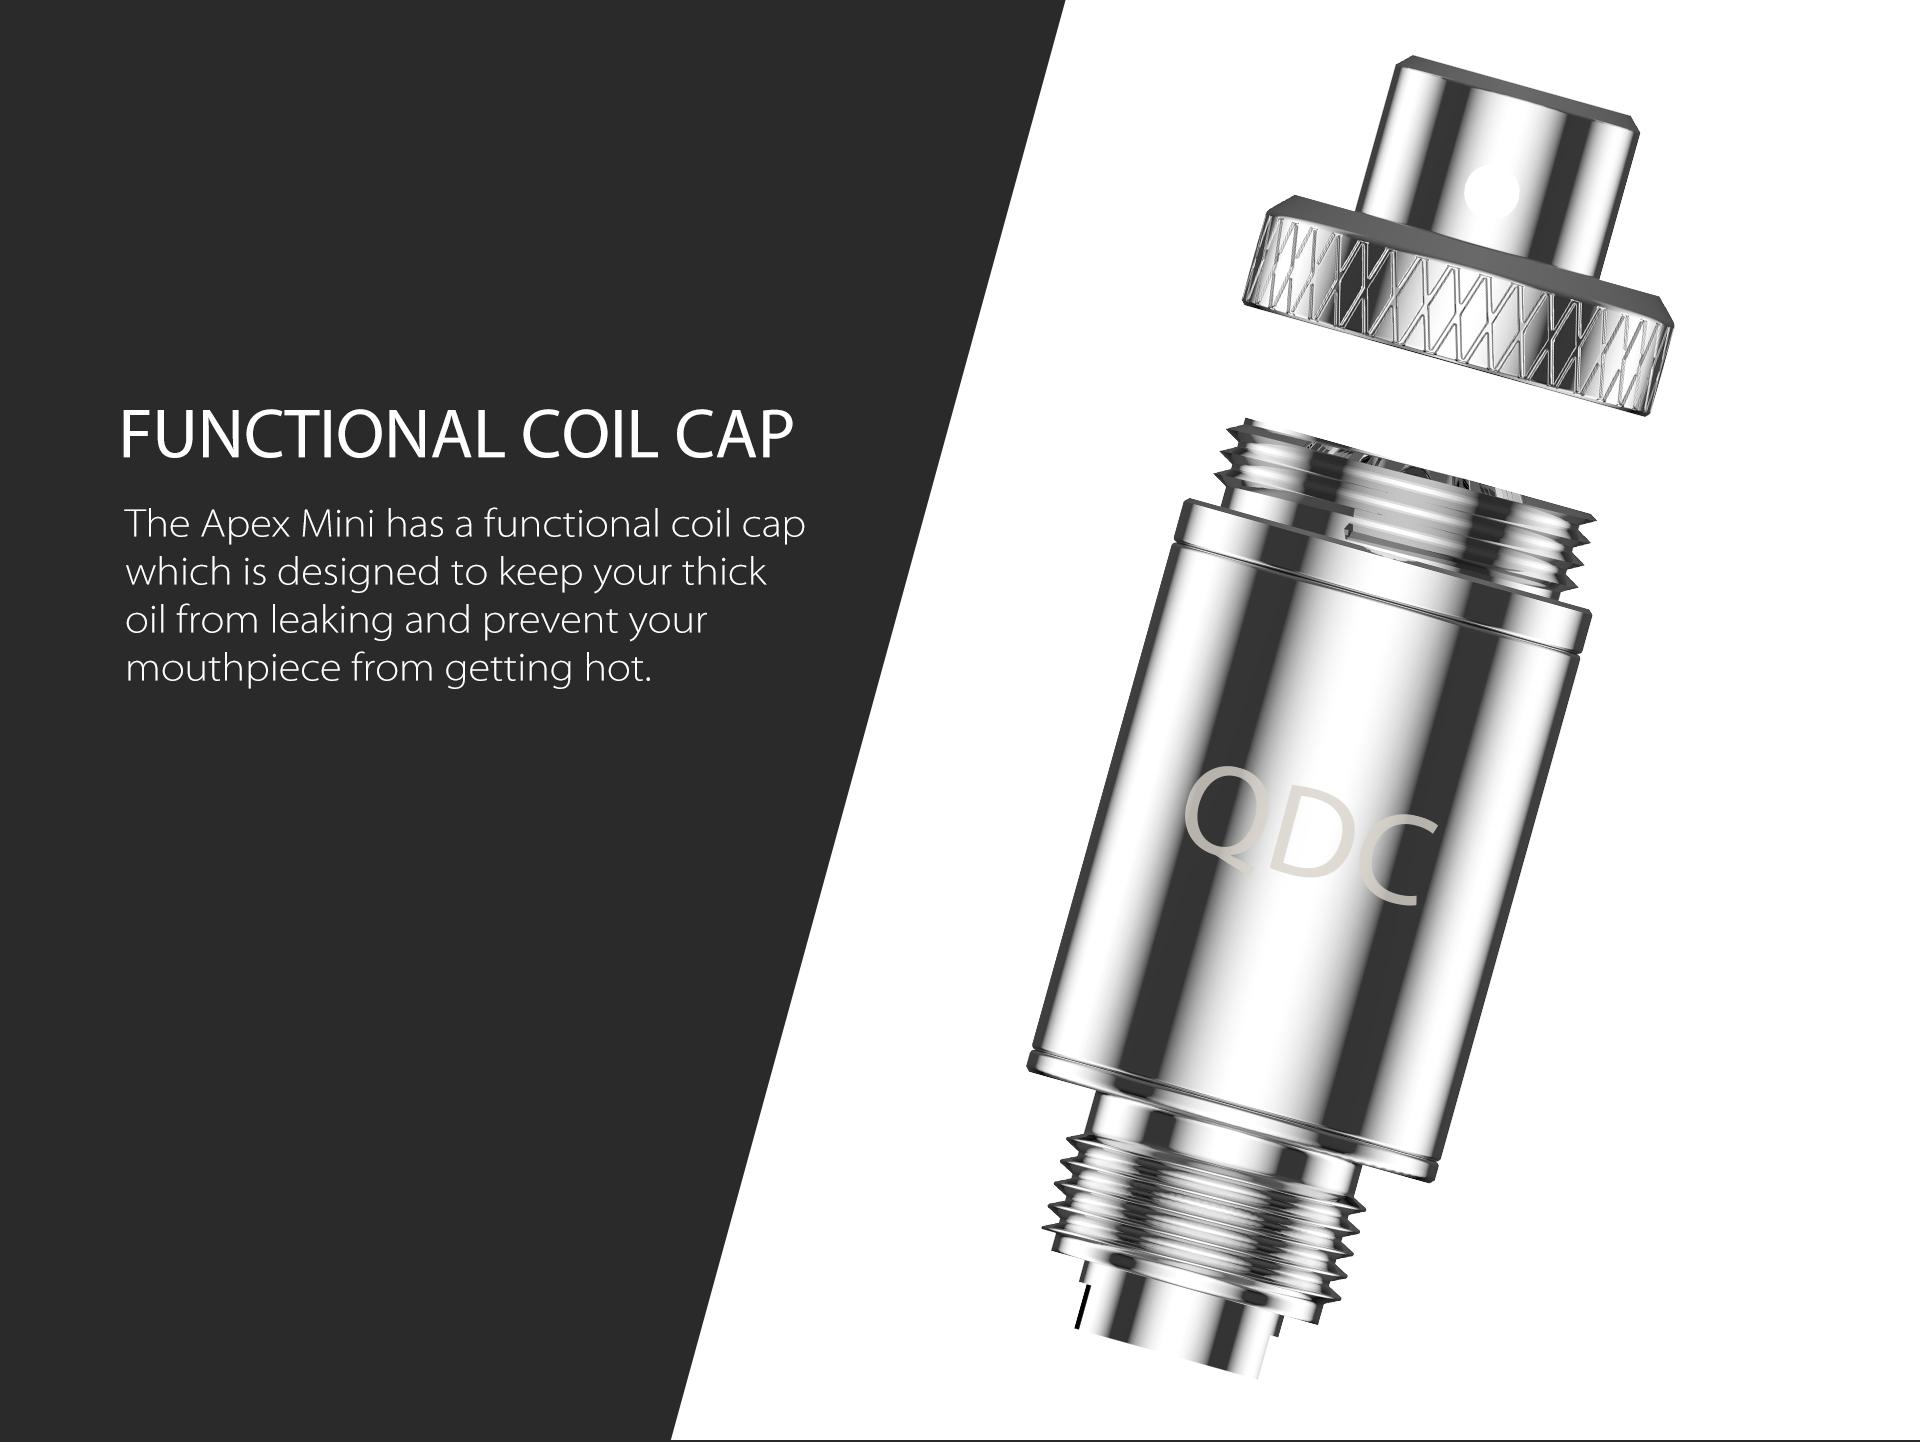 The Apex Mini has a functional coil cap.